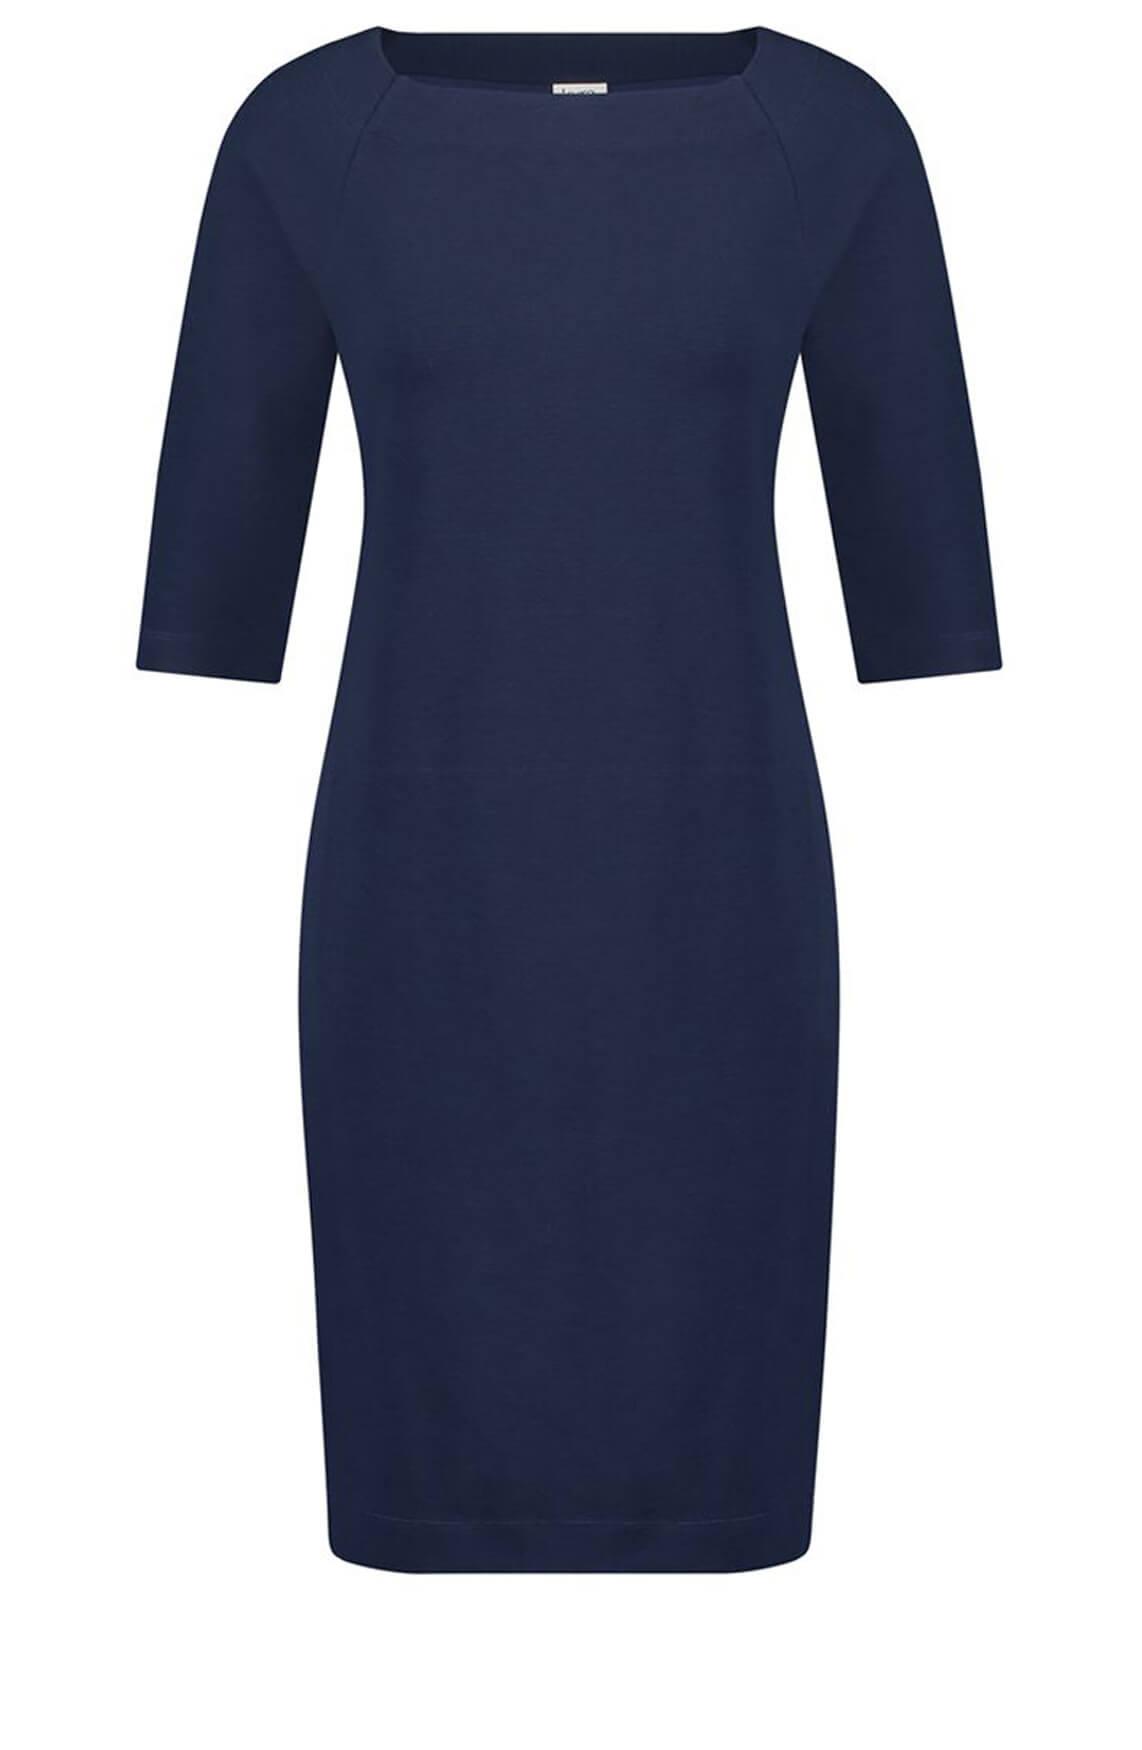 Kyra & Ko Dames Berry jurk Blauw